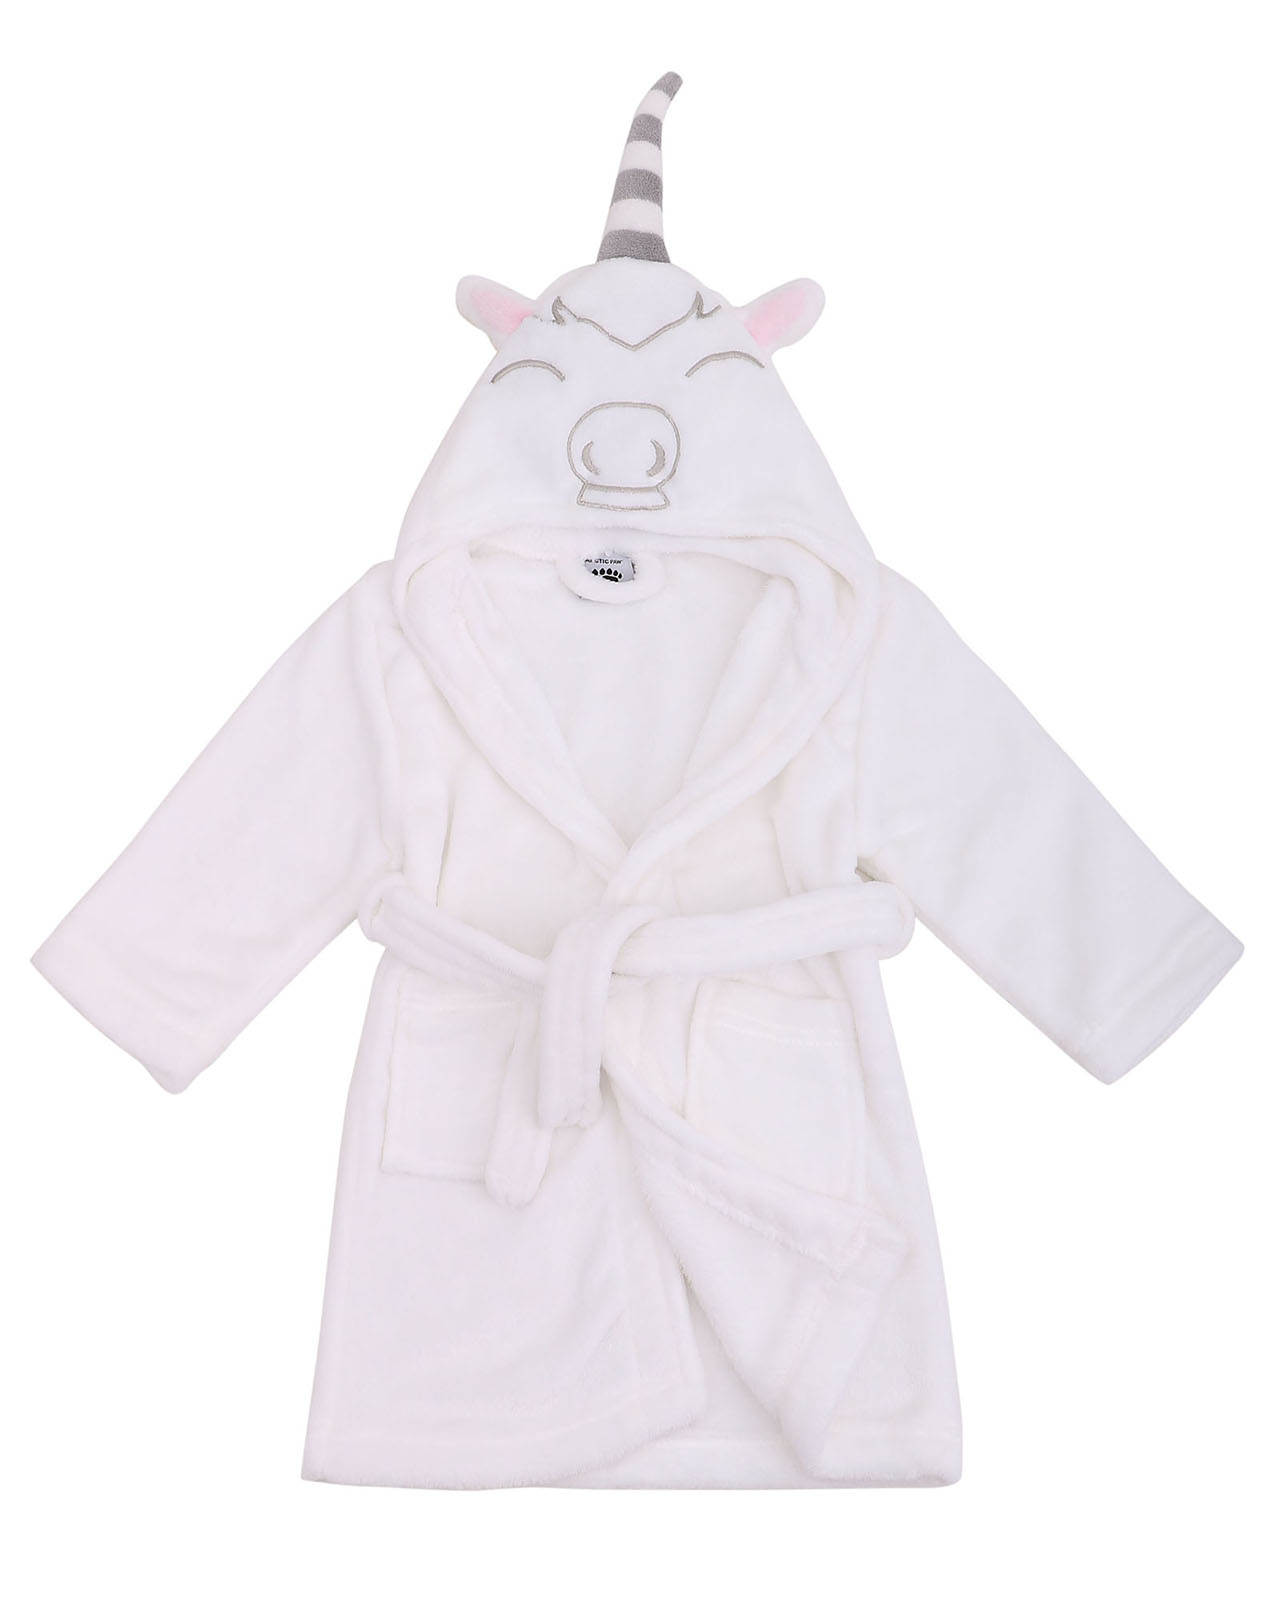 Girls Robe Animal Plush Soft Hooded Terry Bathrobe,Unicorn White,L(7-10 Years)